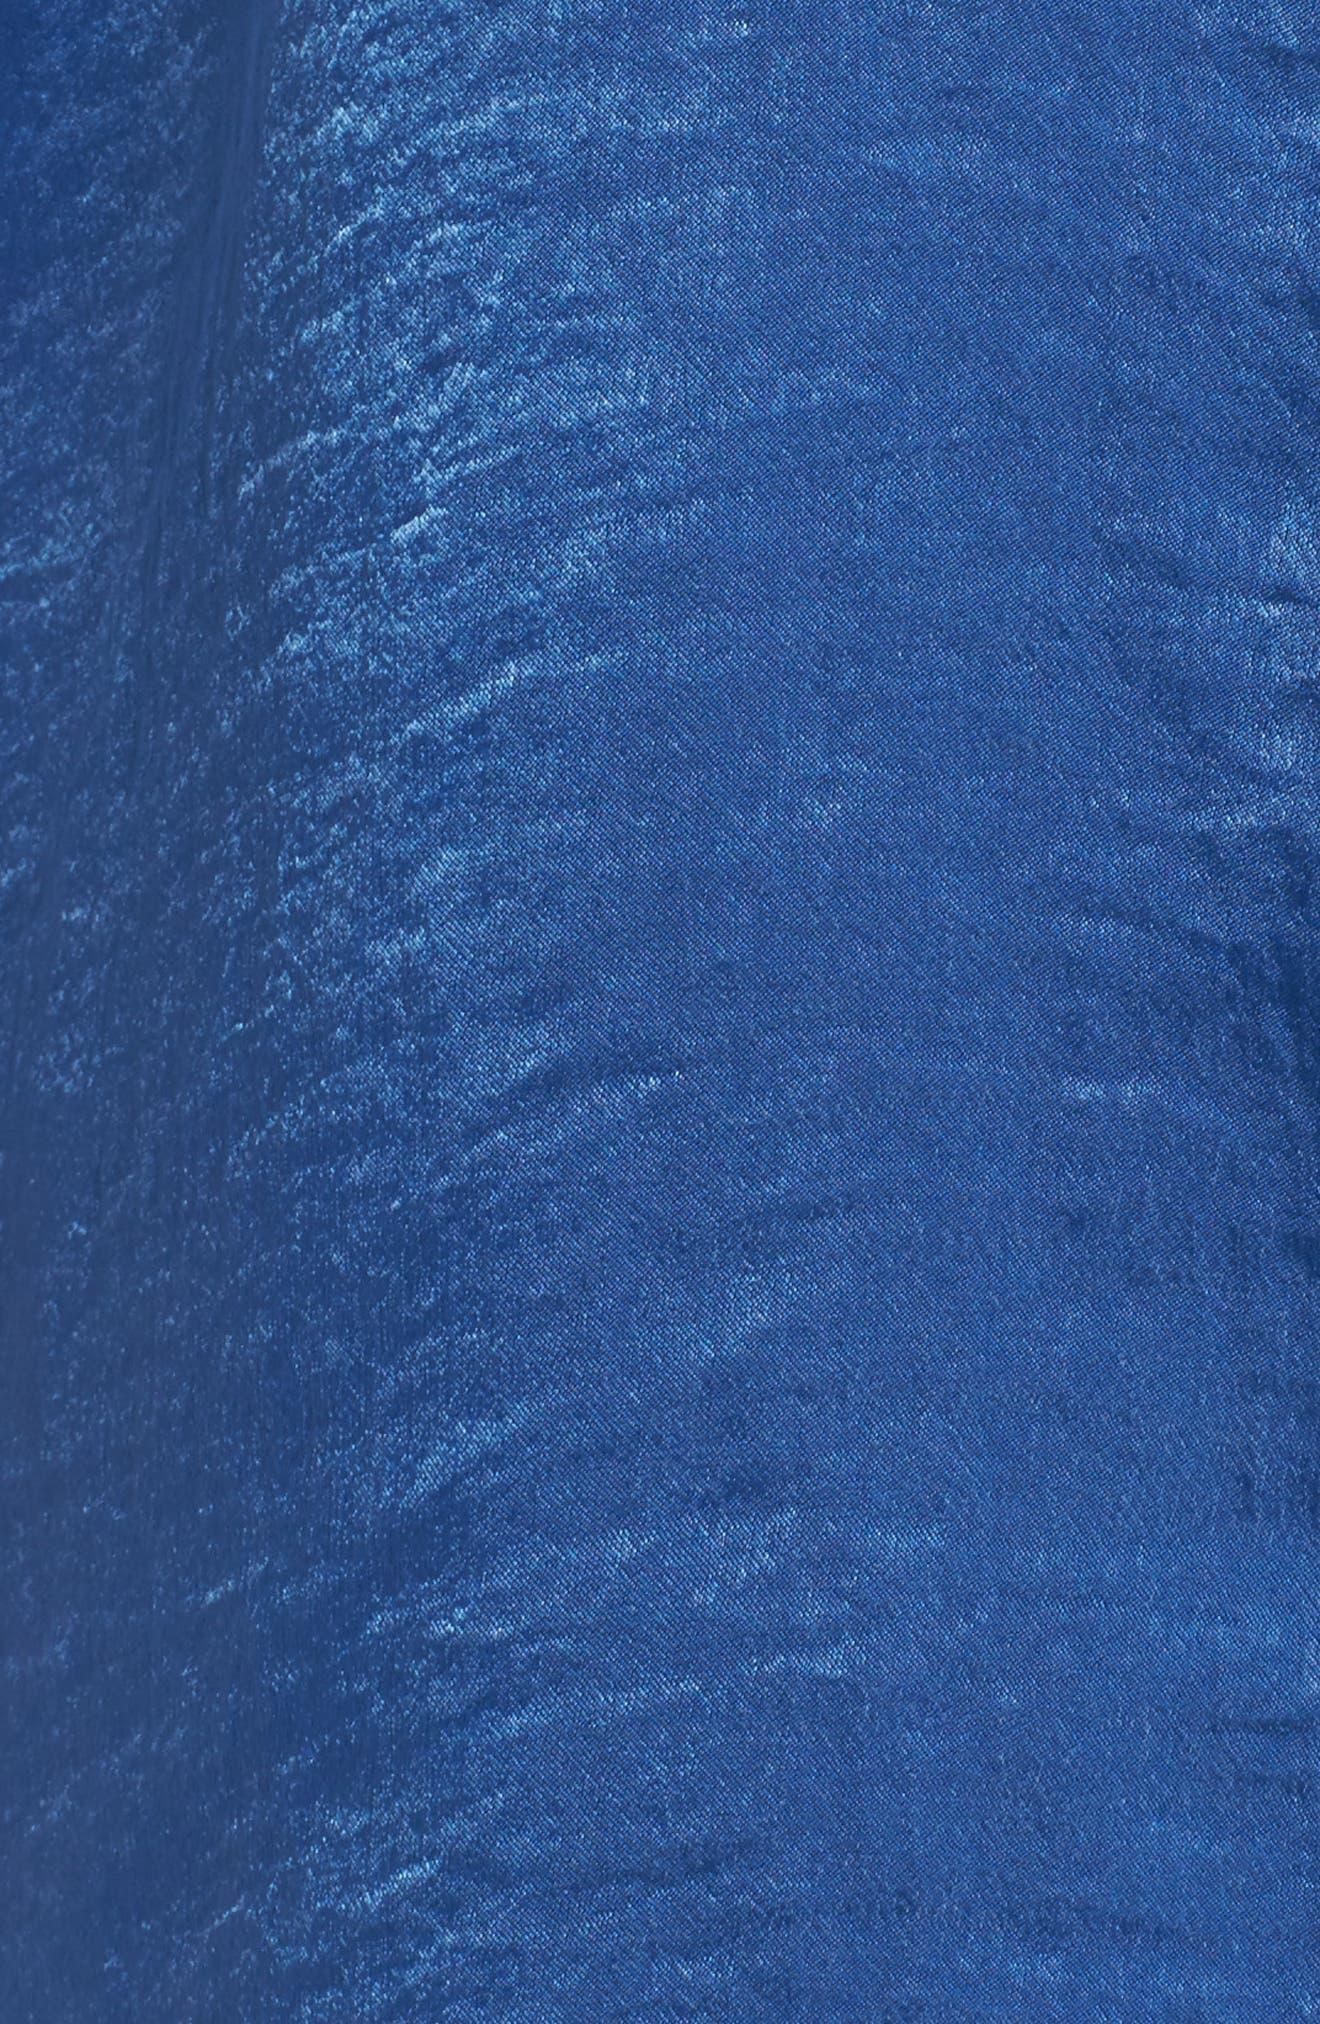 Bell Sleeve Rumpled Satin Blouse,                             Alternate thumbnail 5, color,                             322-Divine Blue